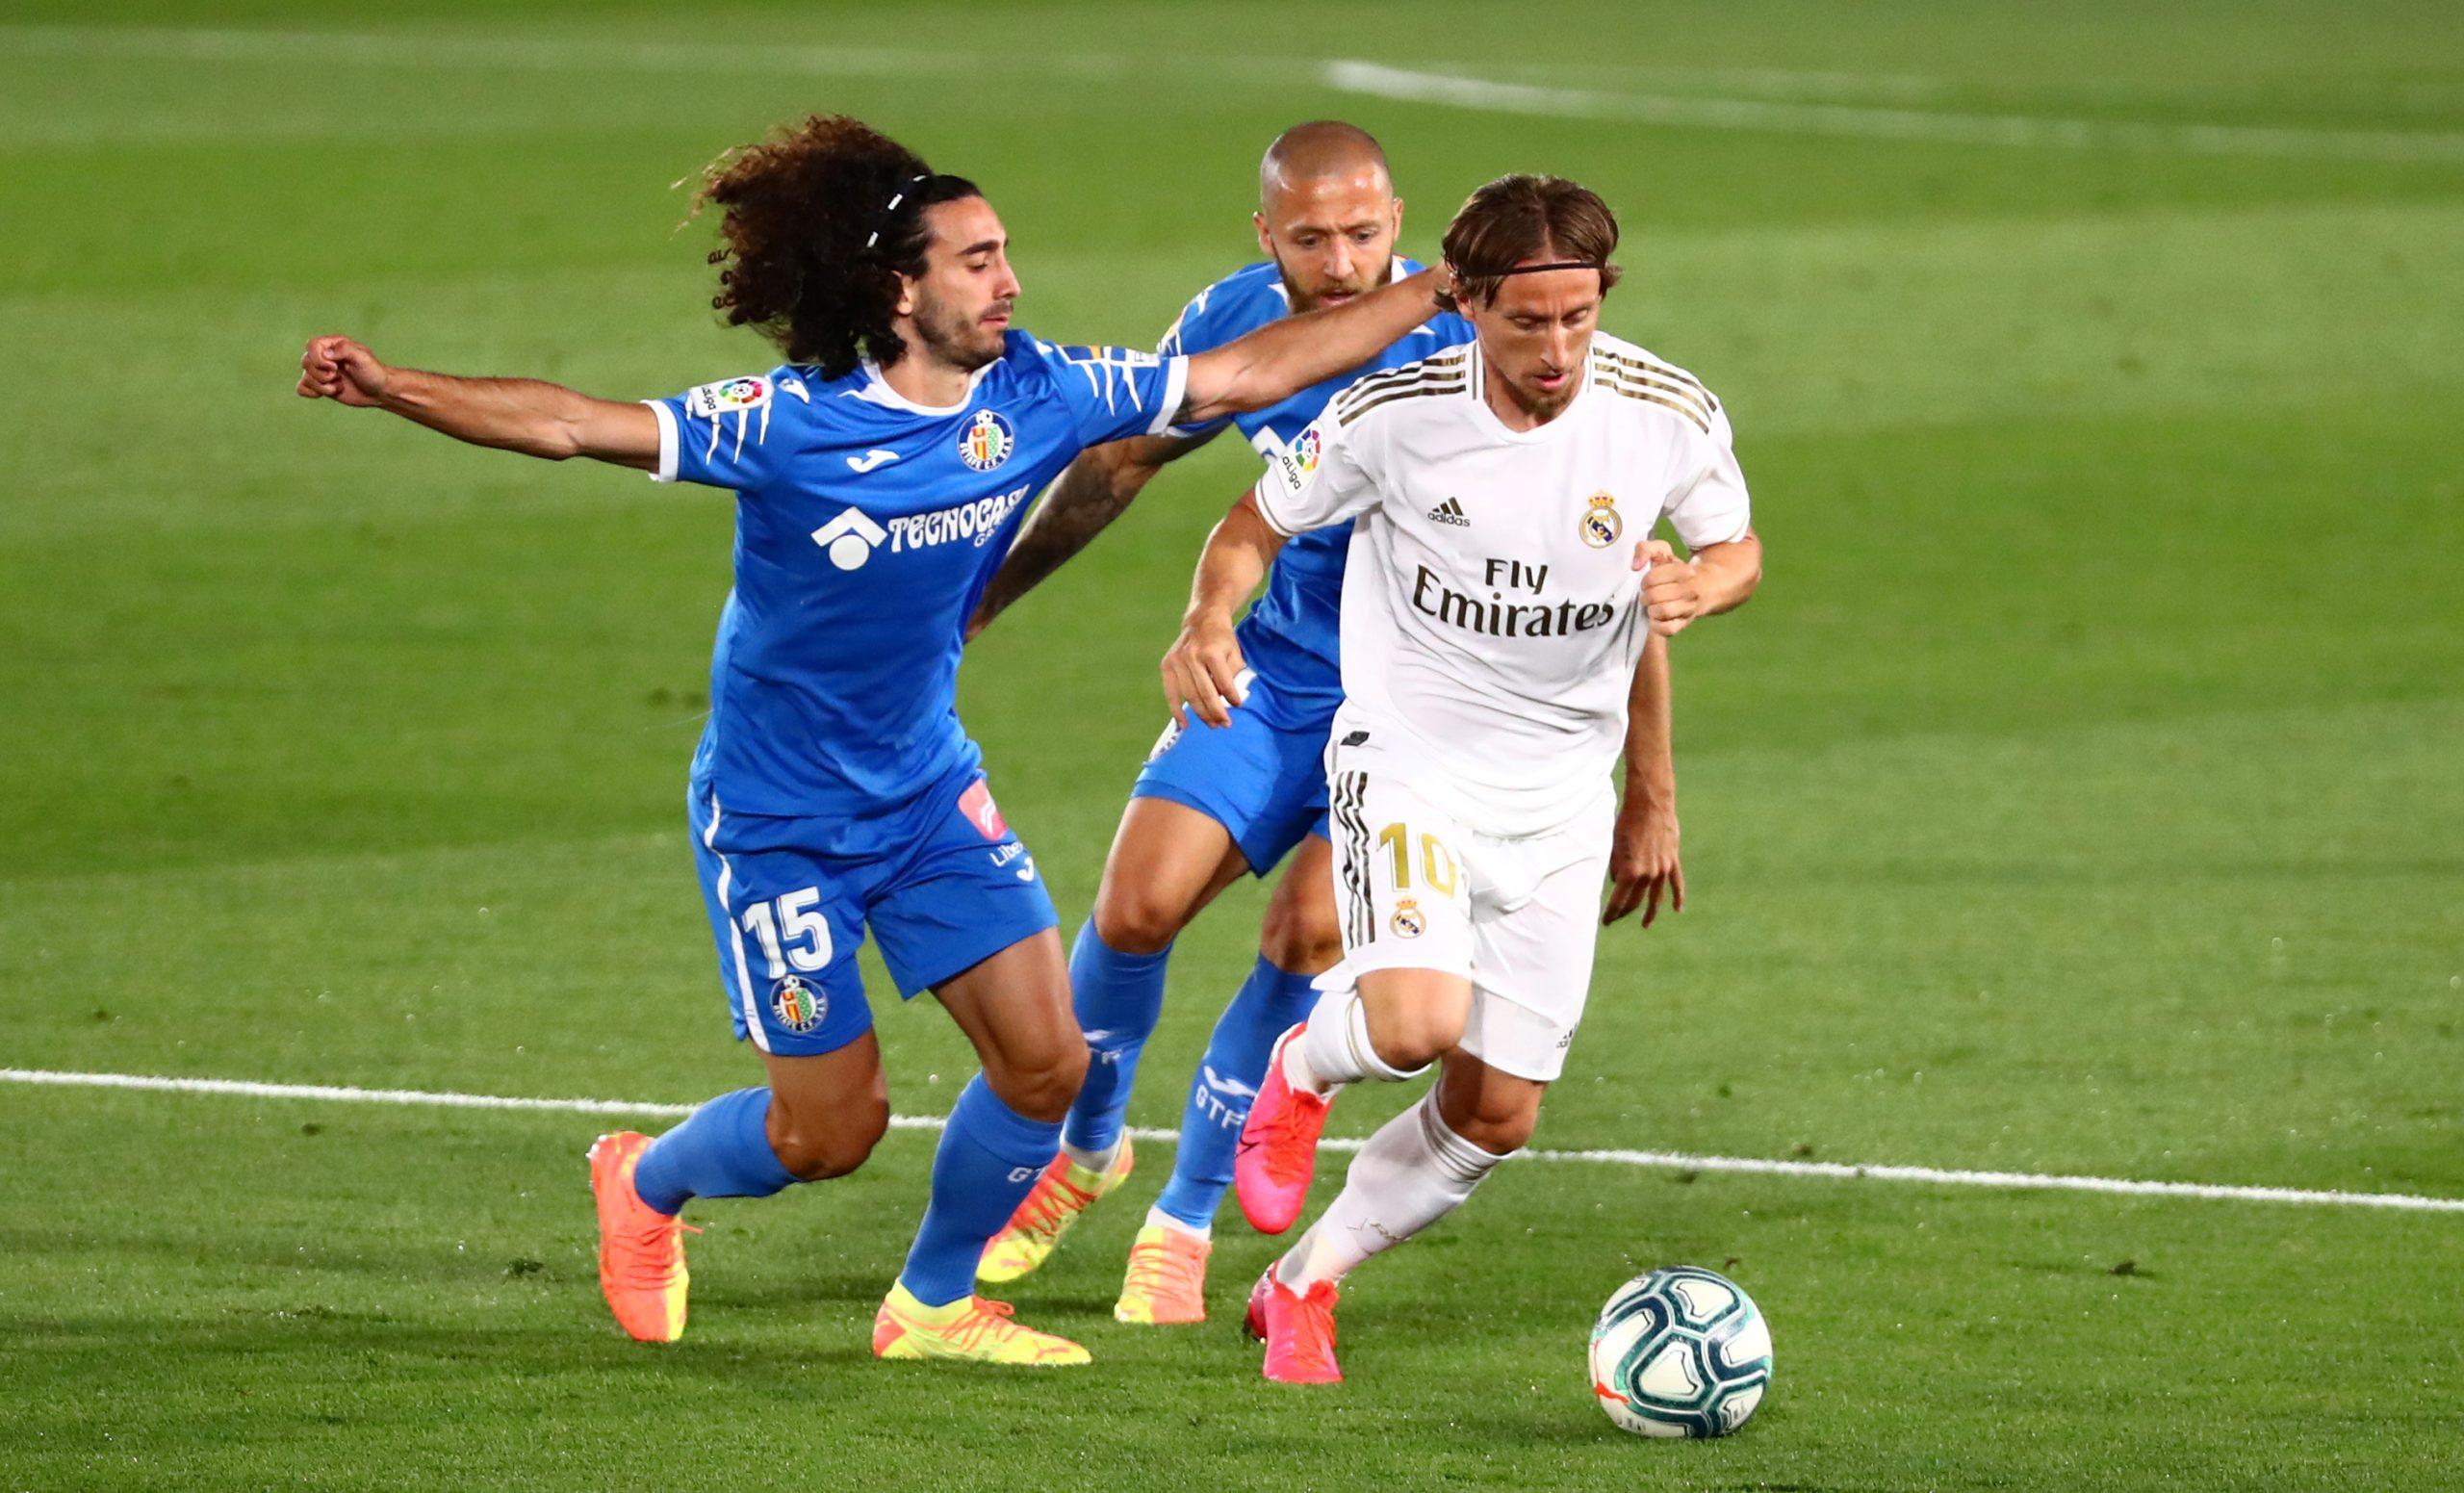 Luka Modrić u duelu s Marcom Cucurellom (Getafe)/Foto REUTERS